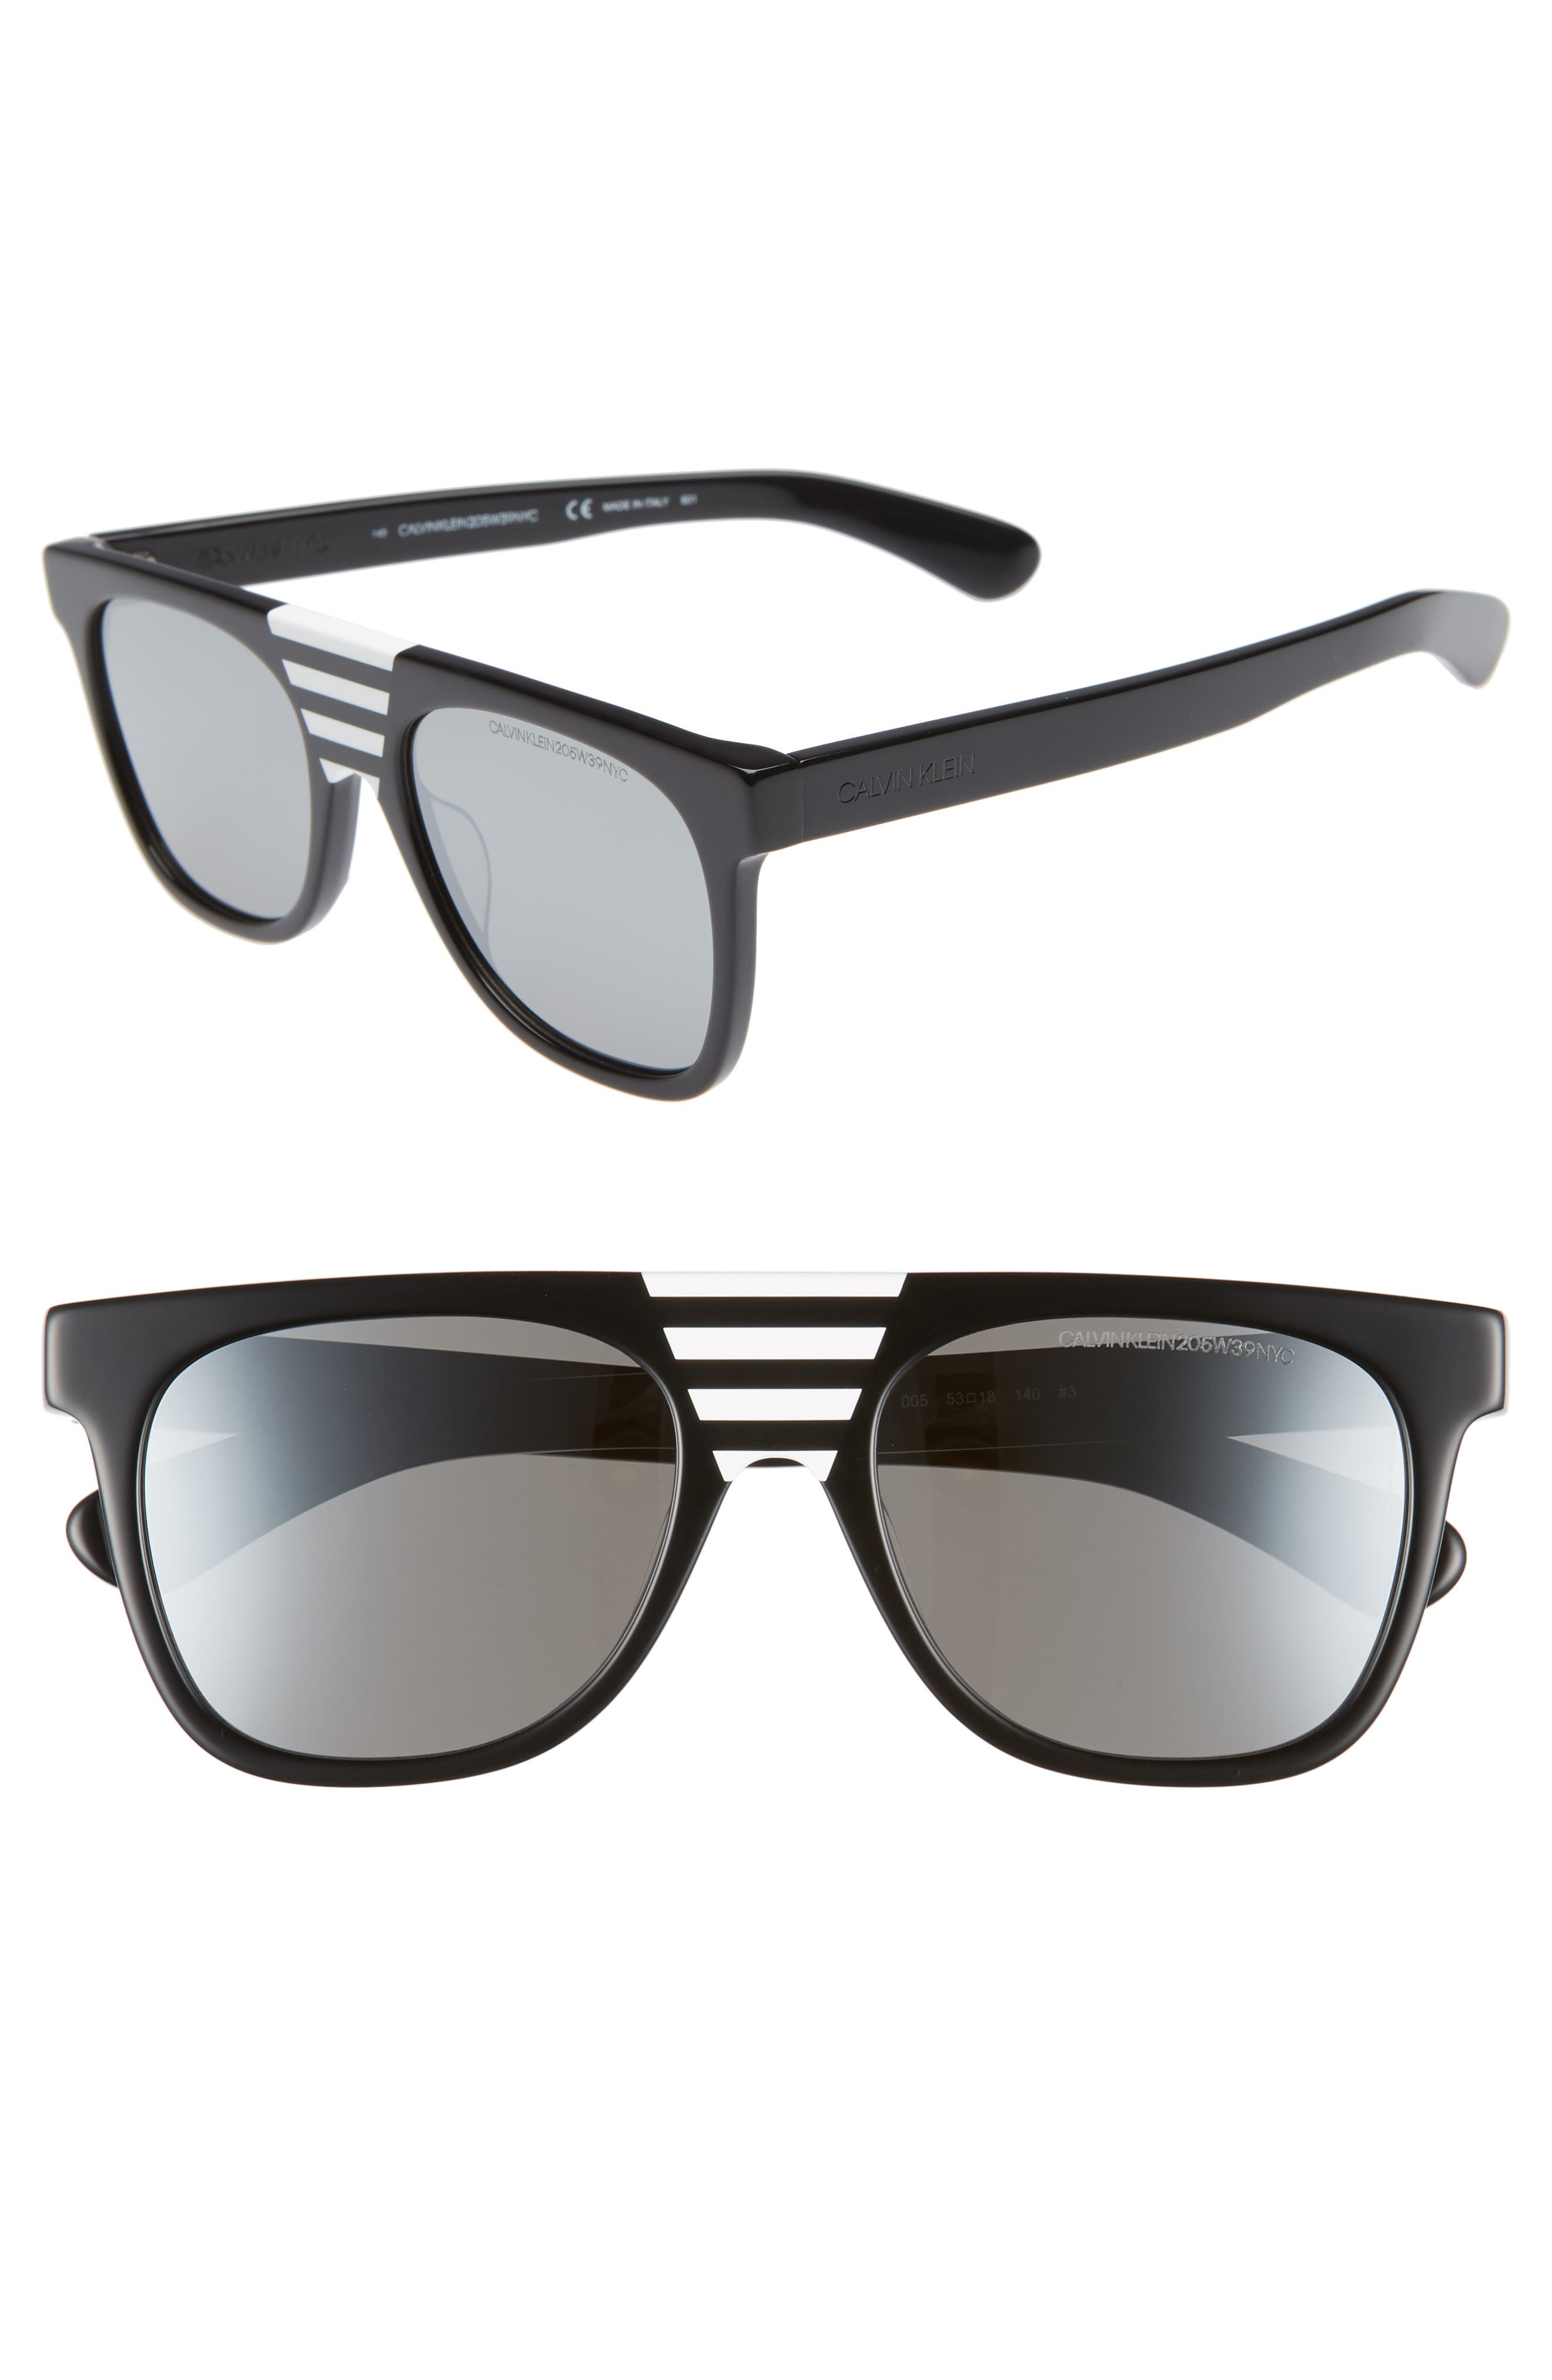 Flattop Acetate Mirrored Sunglasses W/ Contrast Striped Nose Bridge in Black/ Stripes